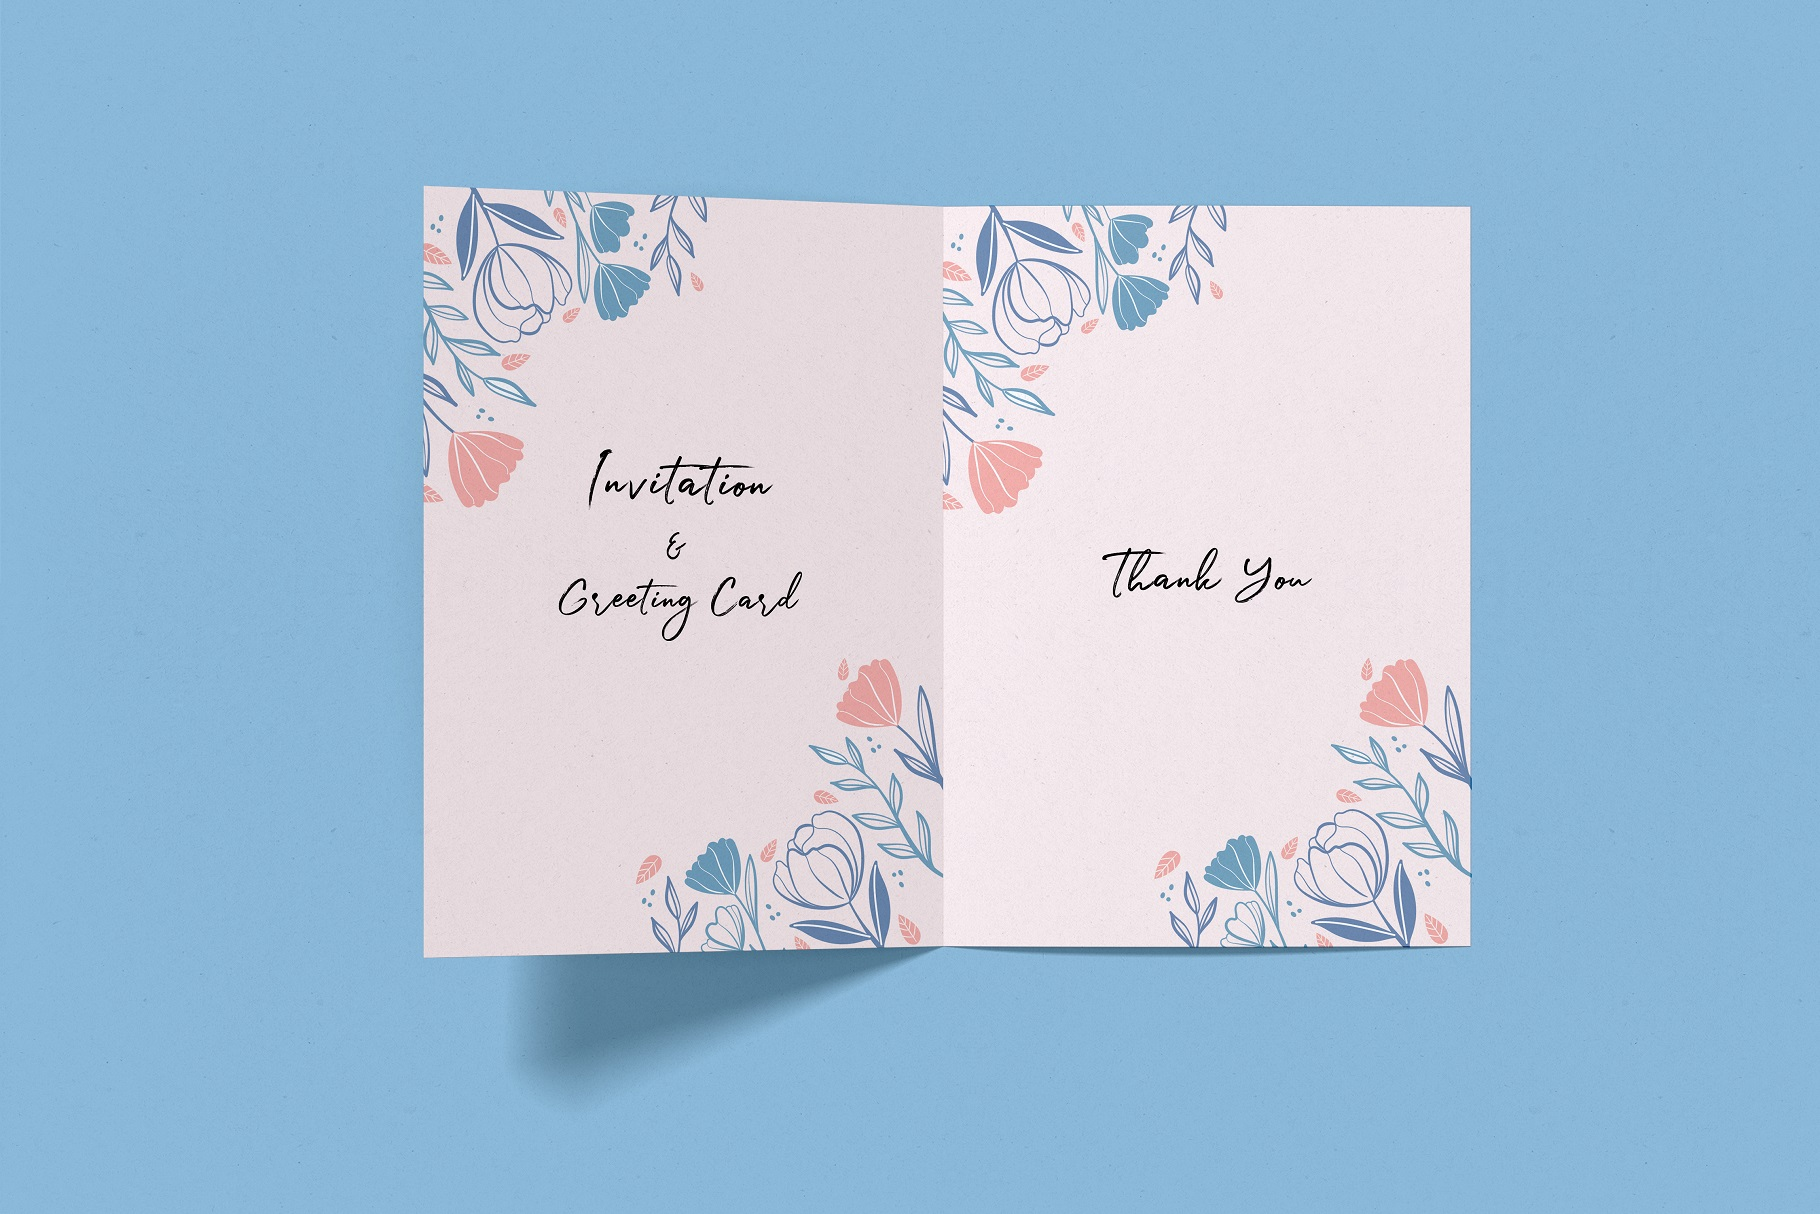 Invitation & Greeting Card Mockup example image 3